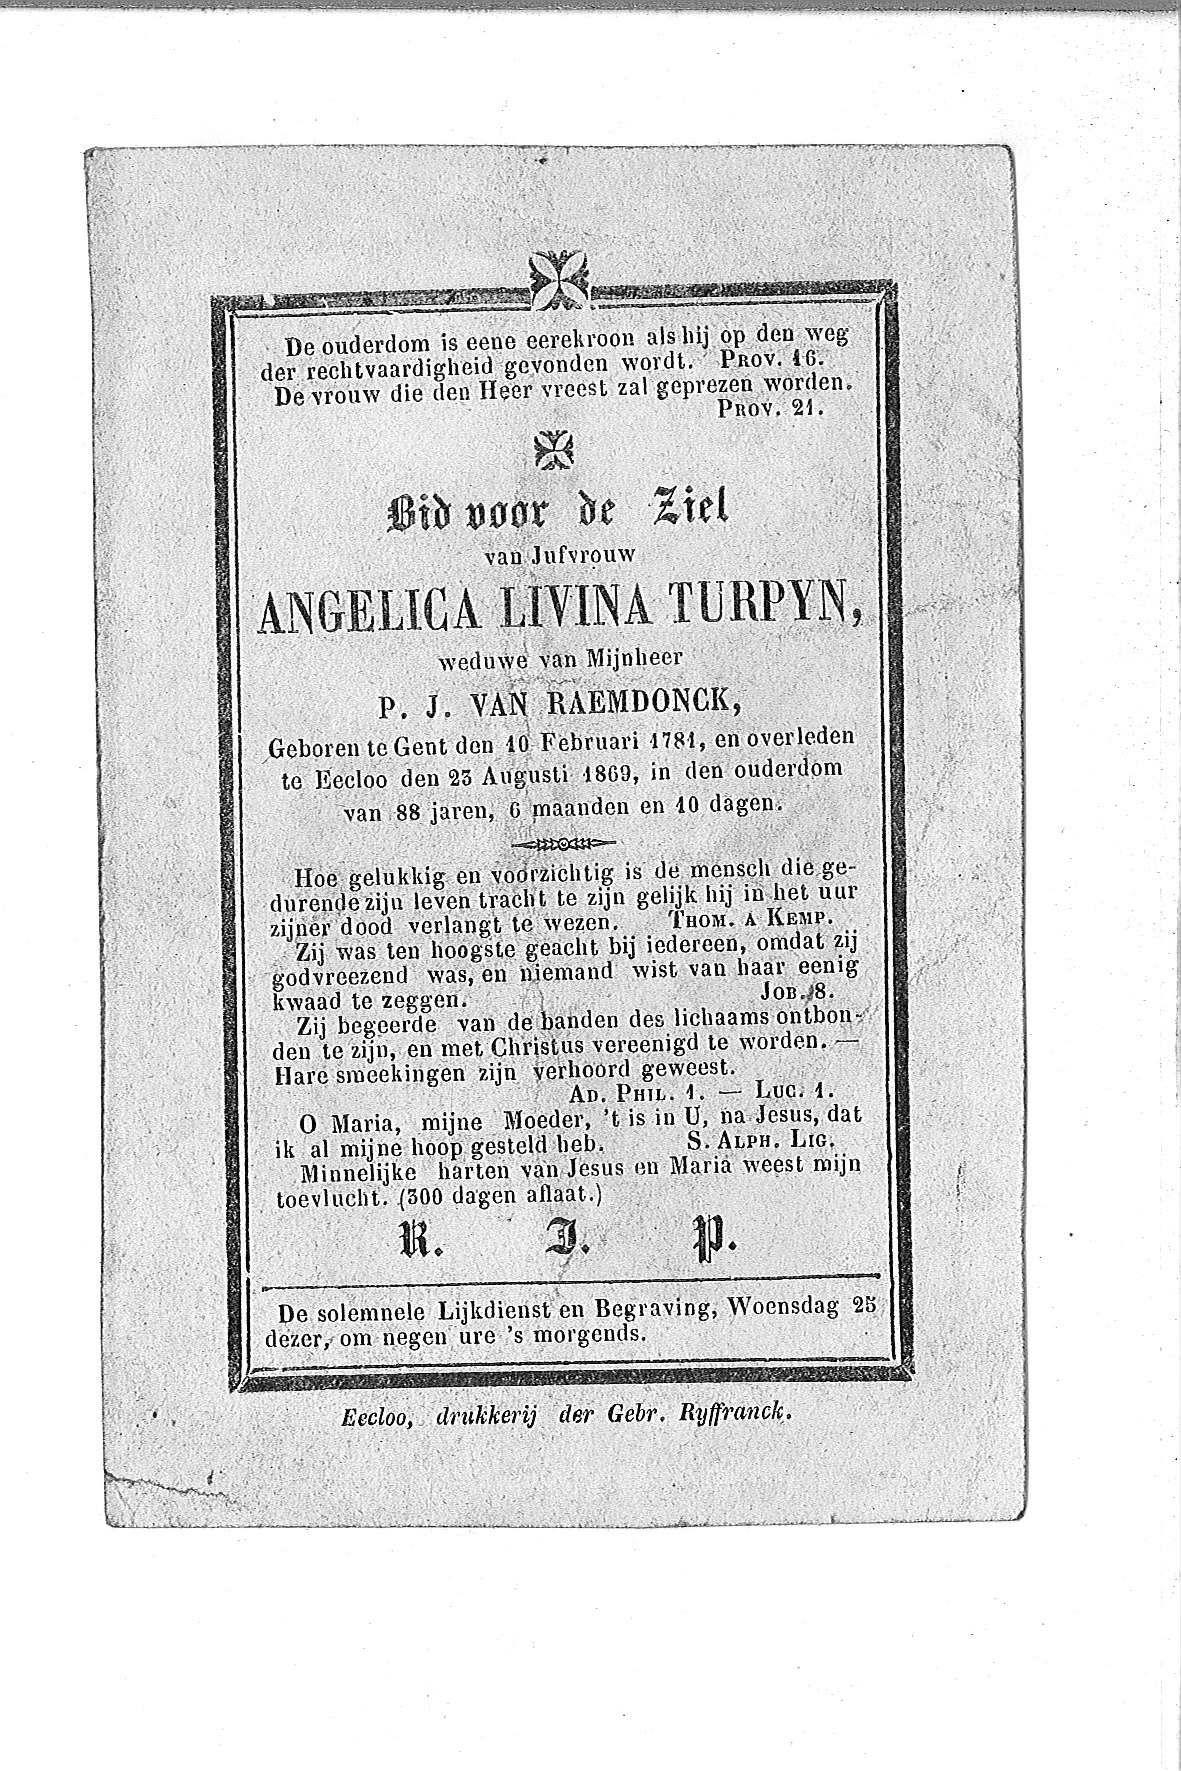 Angelica-Livina(1869)20120621134457_00144.jpg